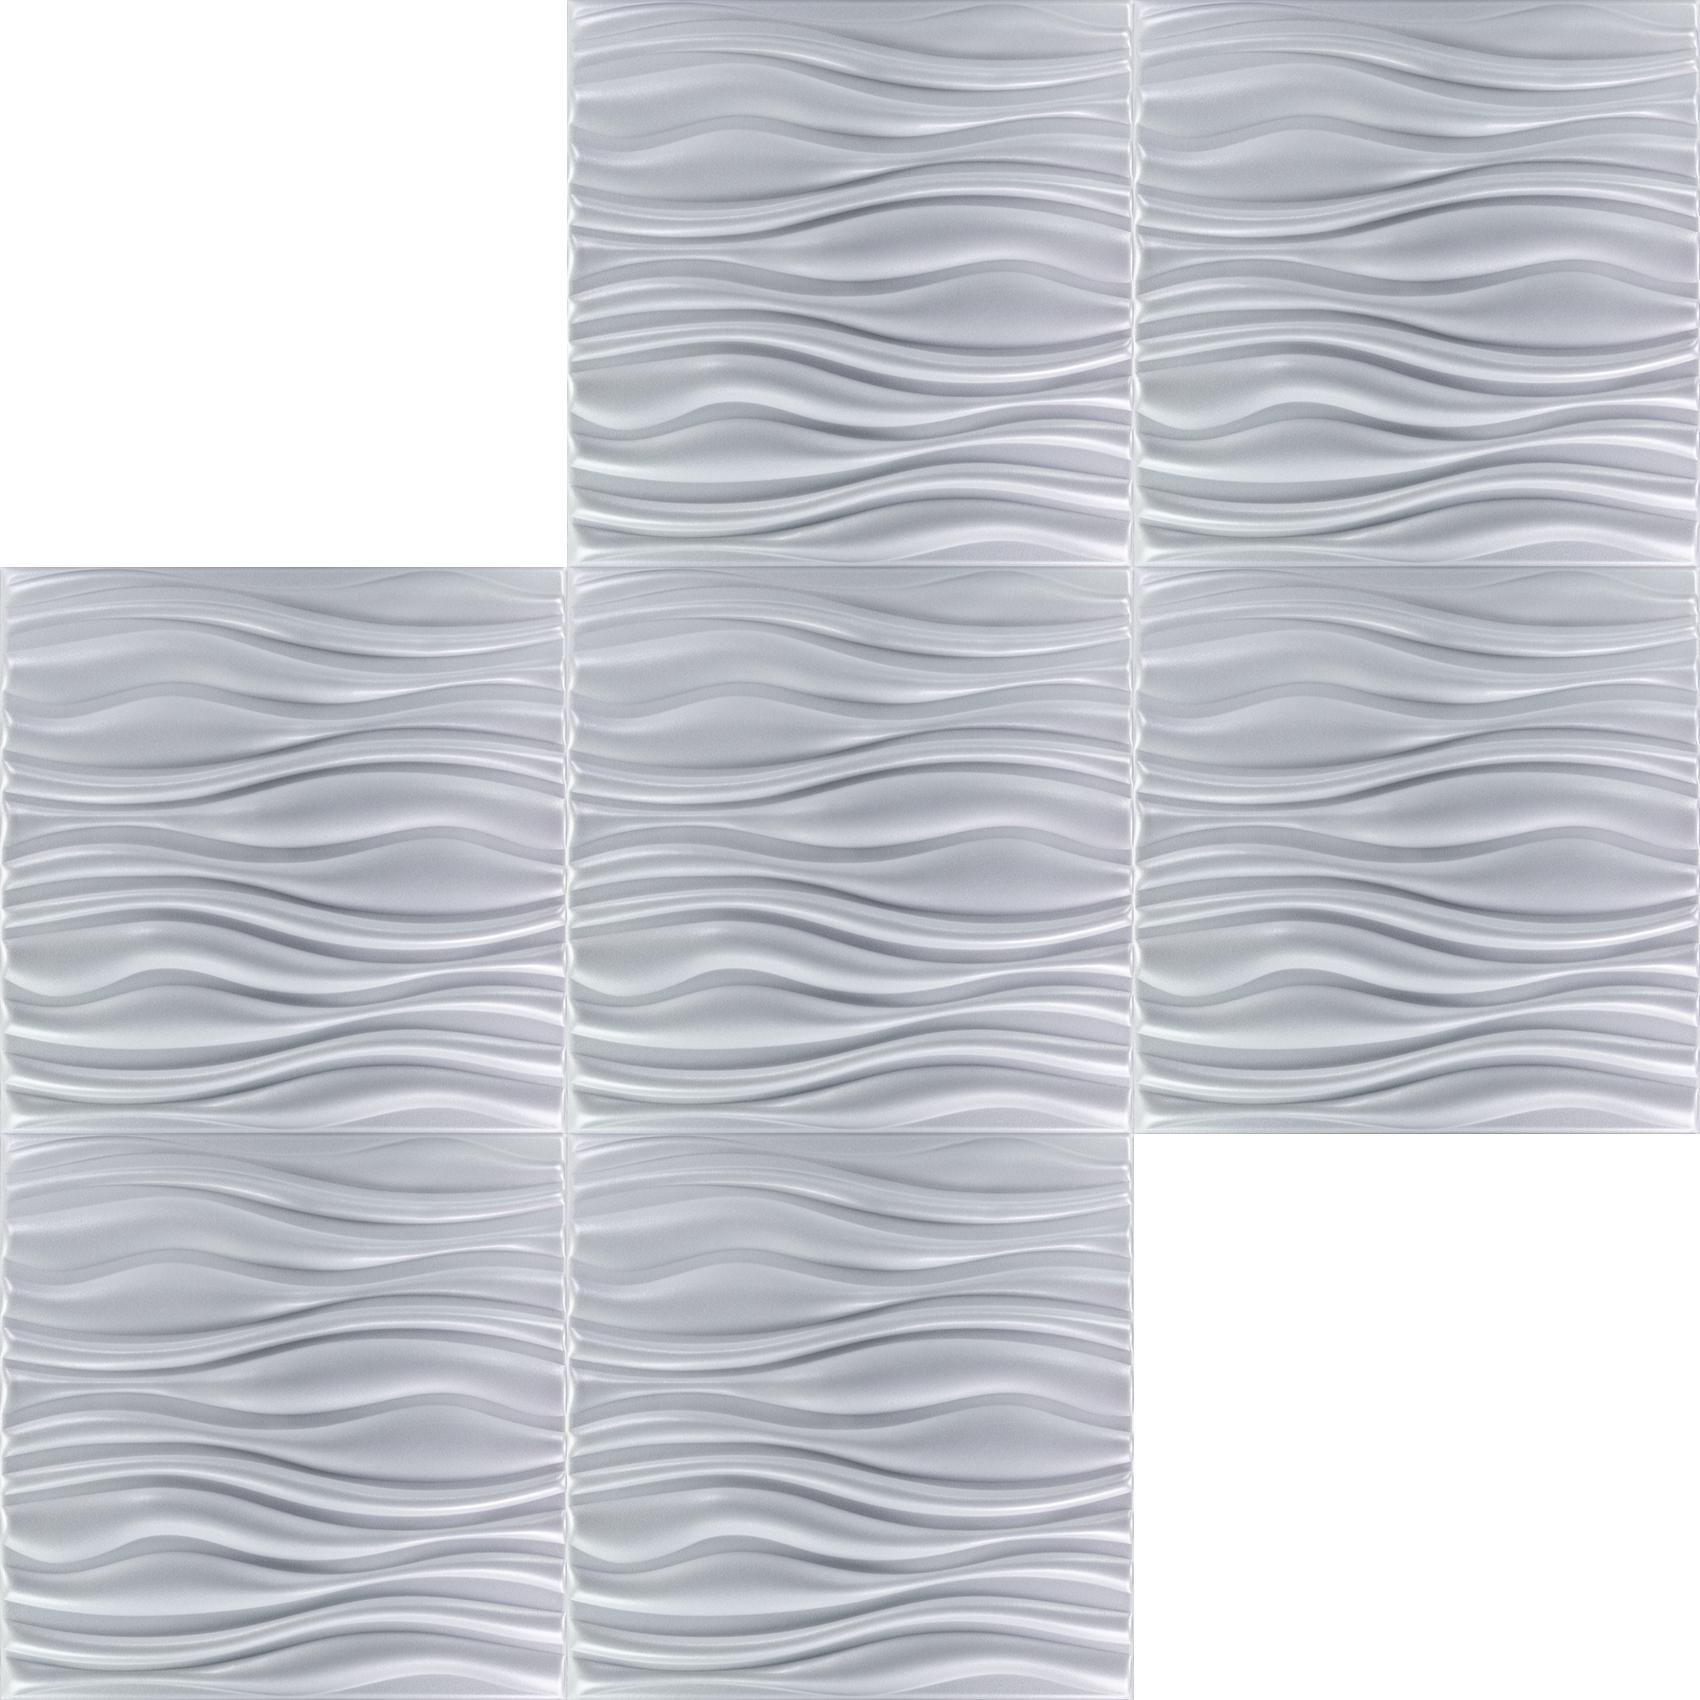 5 m2 platten 3d polystyrol wand decke paneele wandplatten 50x50cm flow ebay. Black Bedroom Furniture Sets. Home Design Ideas